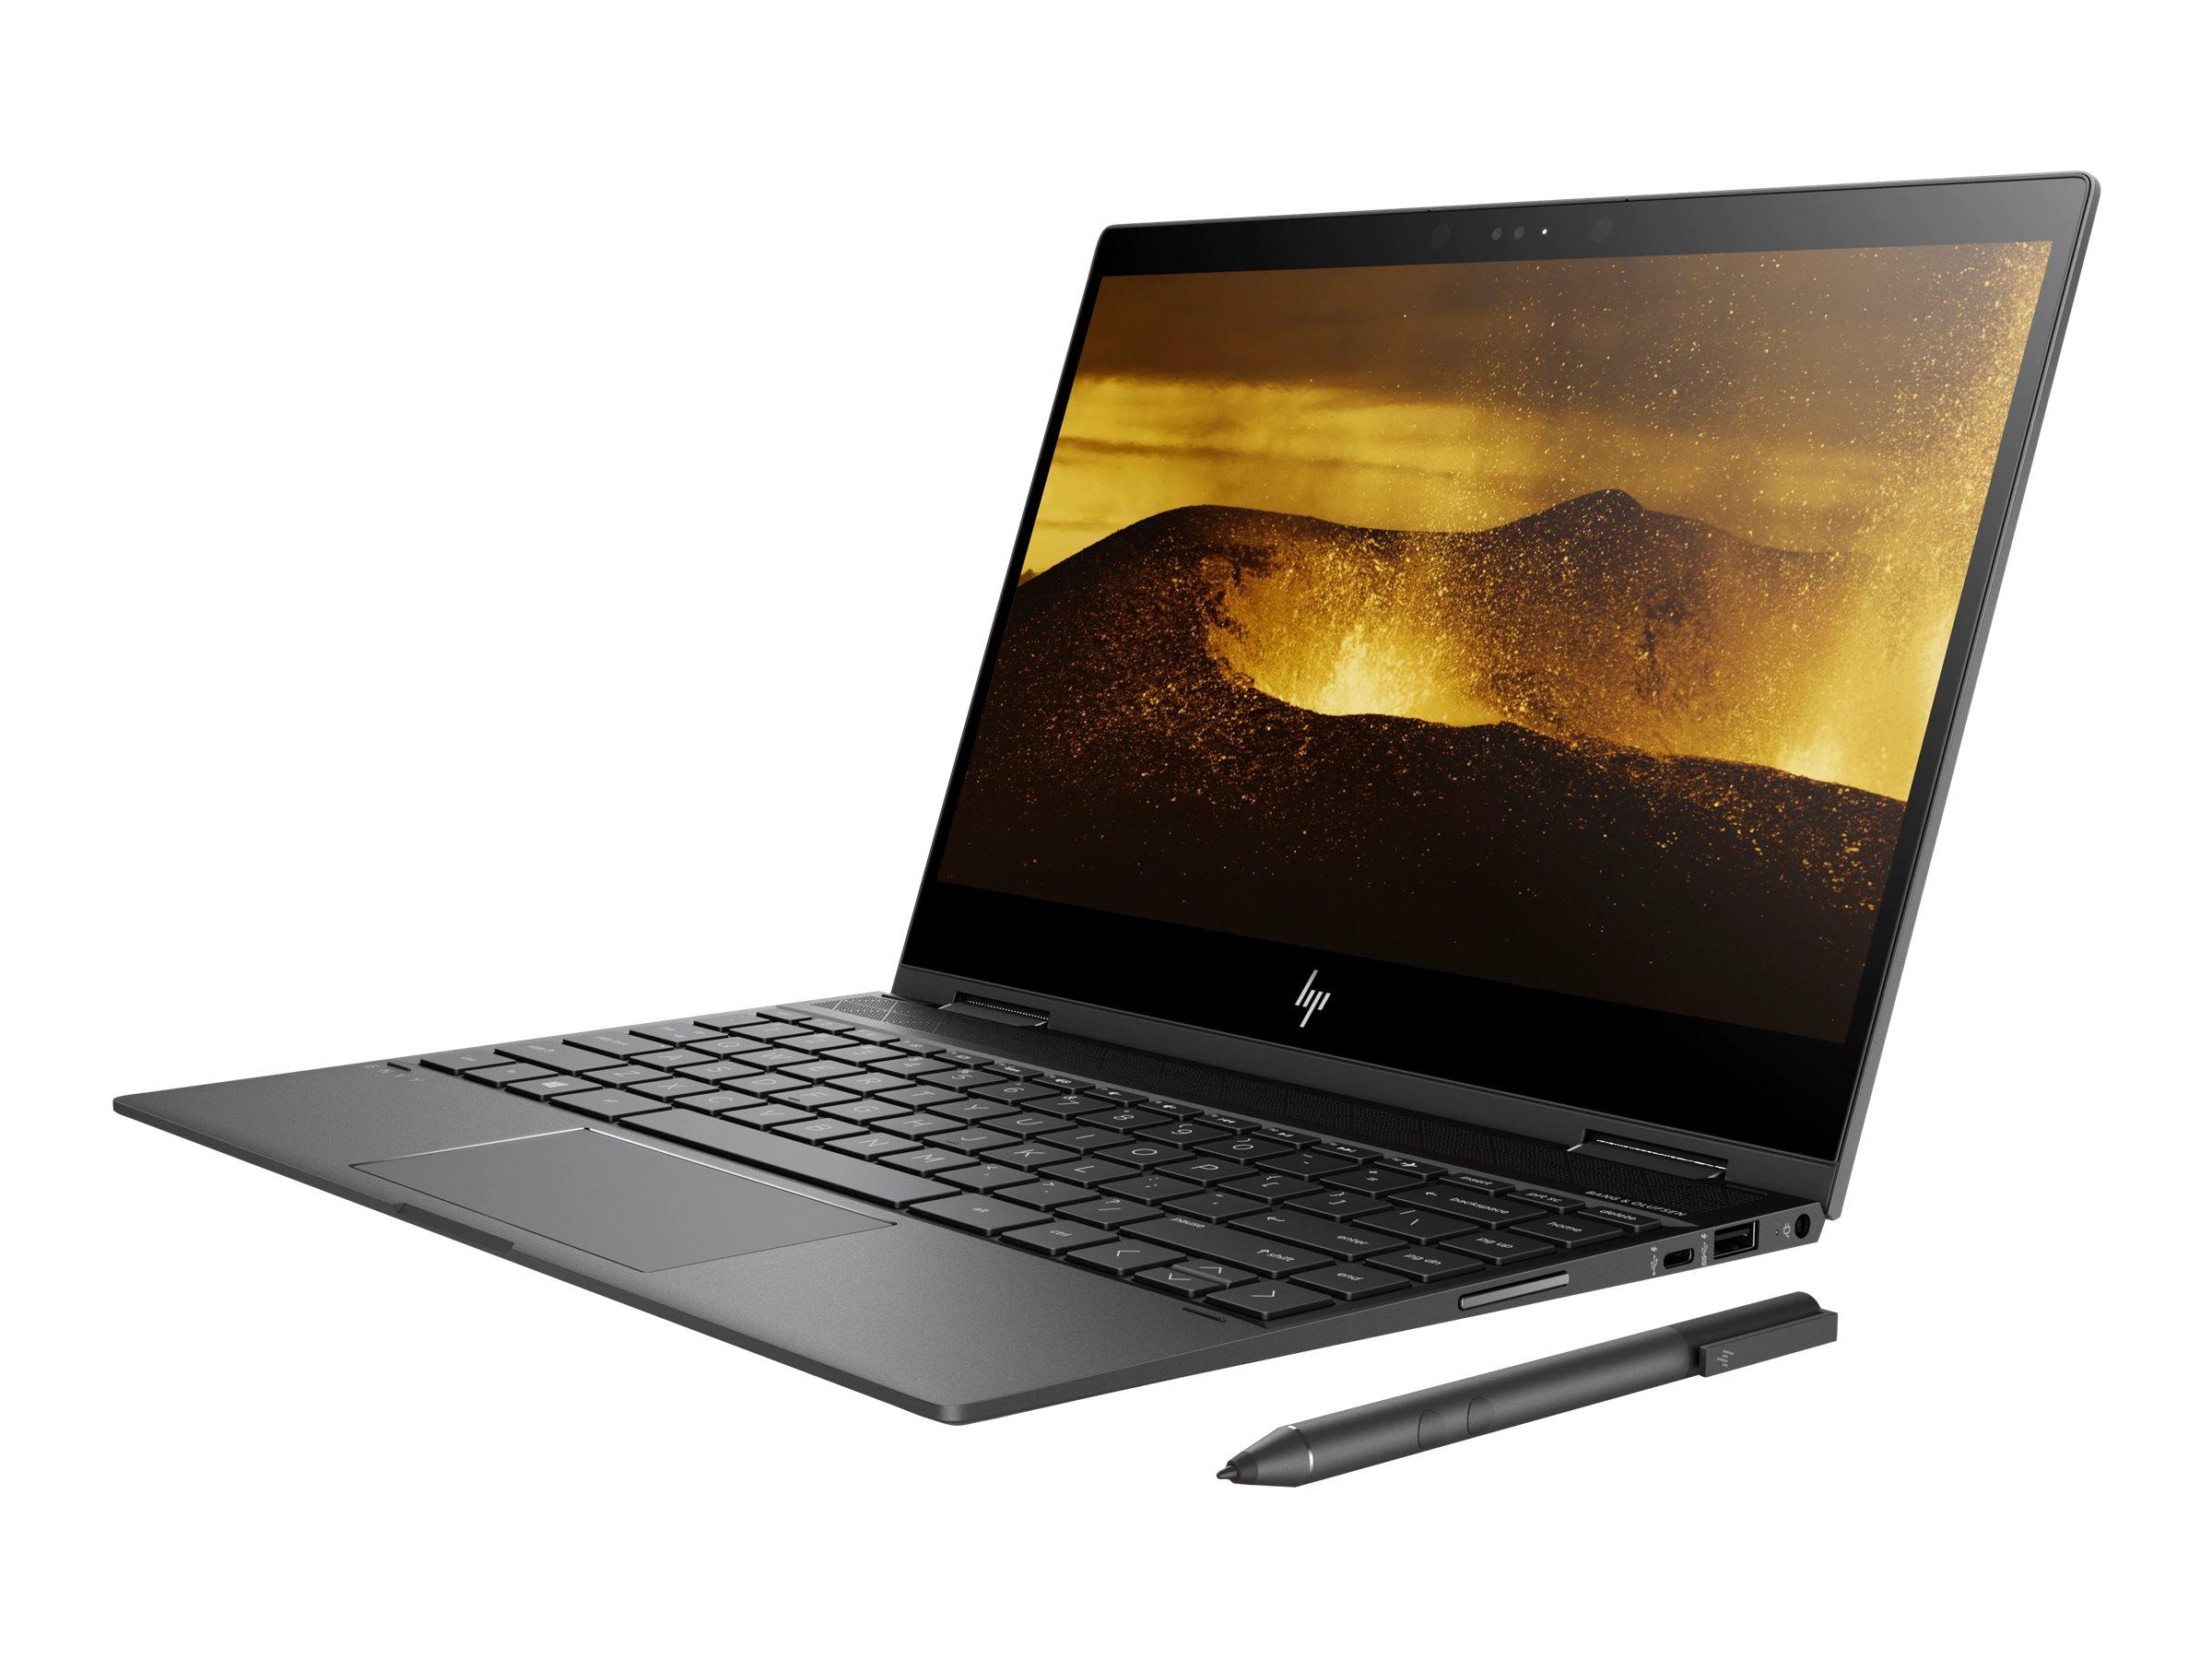 HP ENVY x360 13-ag0001ng 2GHz 2500U AMD Ryzen 5 13.3Zoll 1920 x 1080Pixel Touchscreen Schwarz - Silber Hybrid (2-in-1)